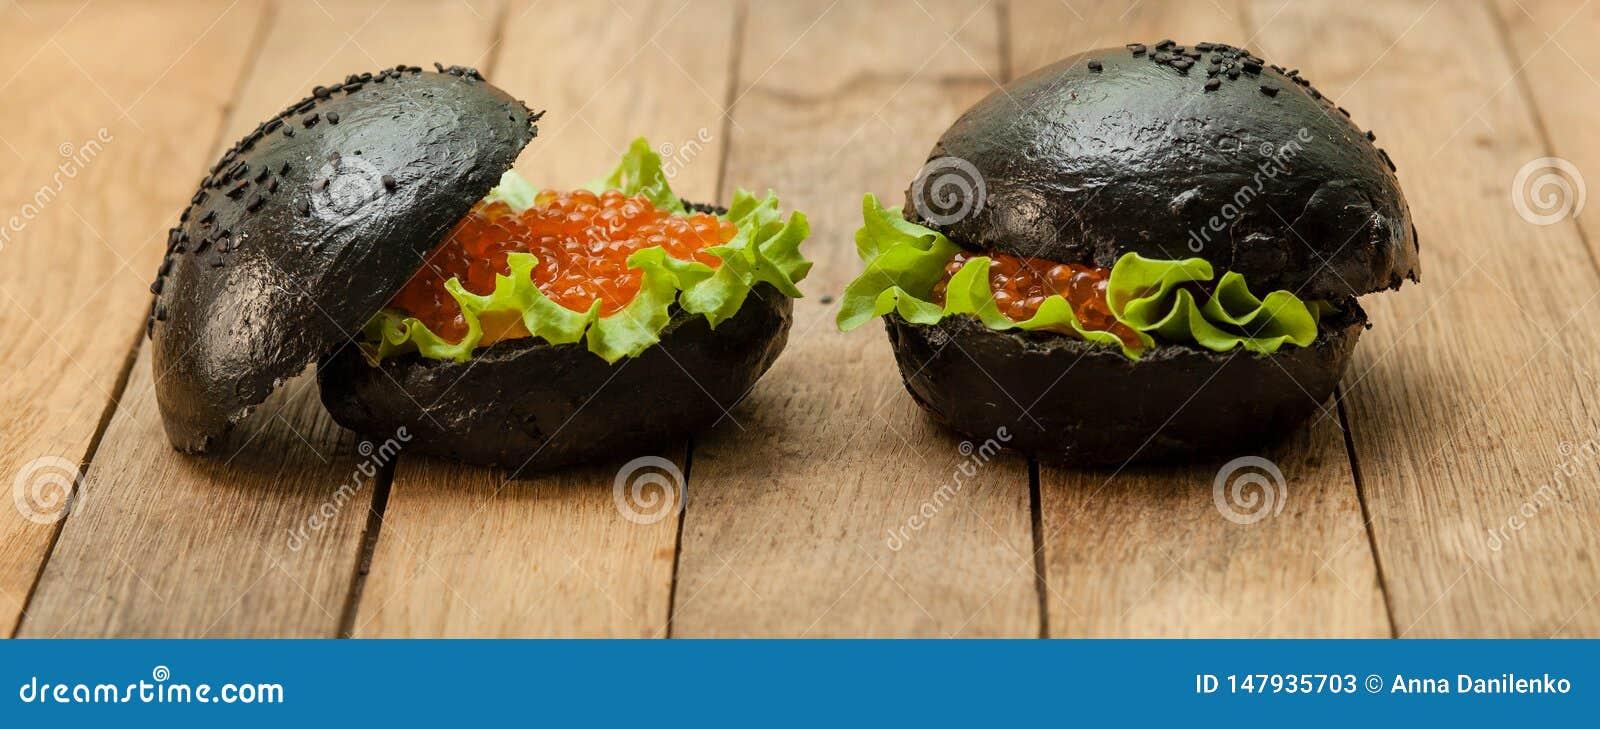 Hamburger preto com caviar